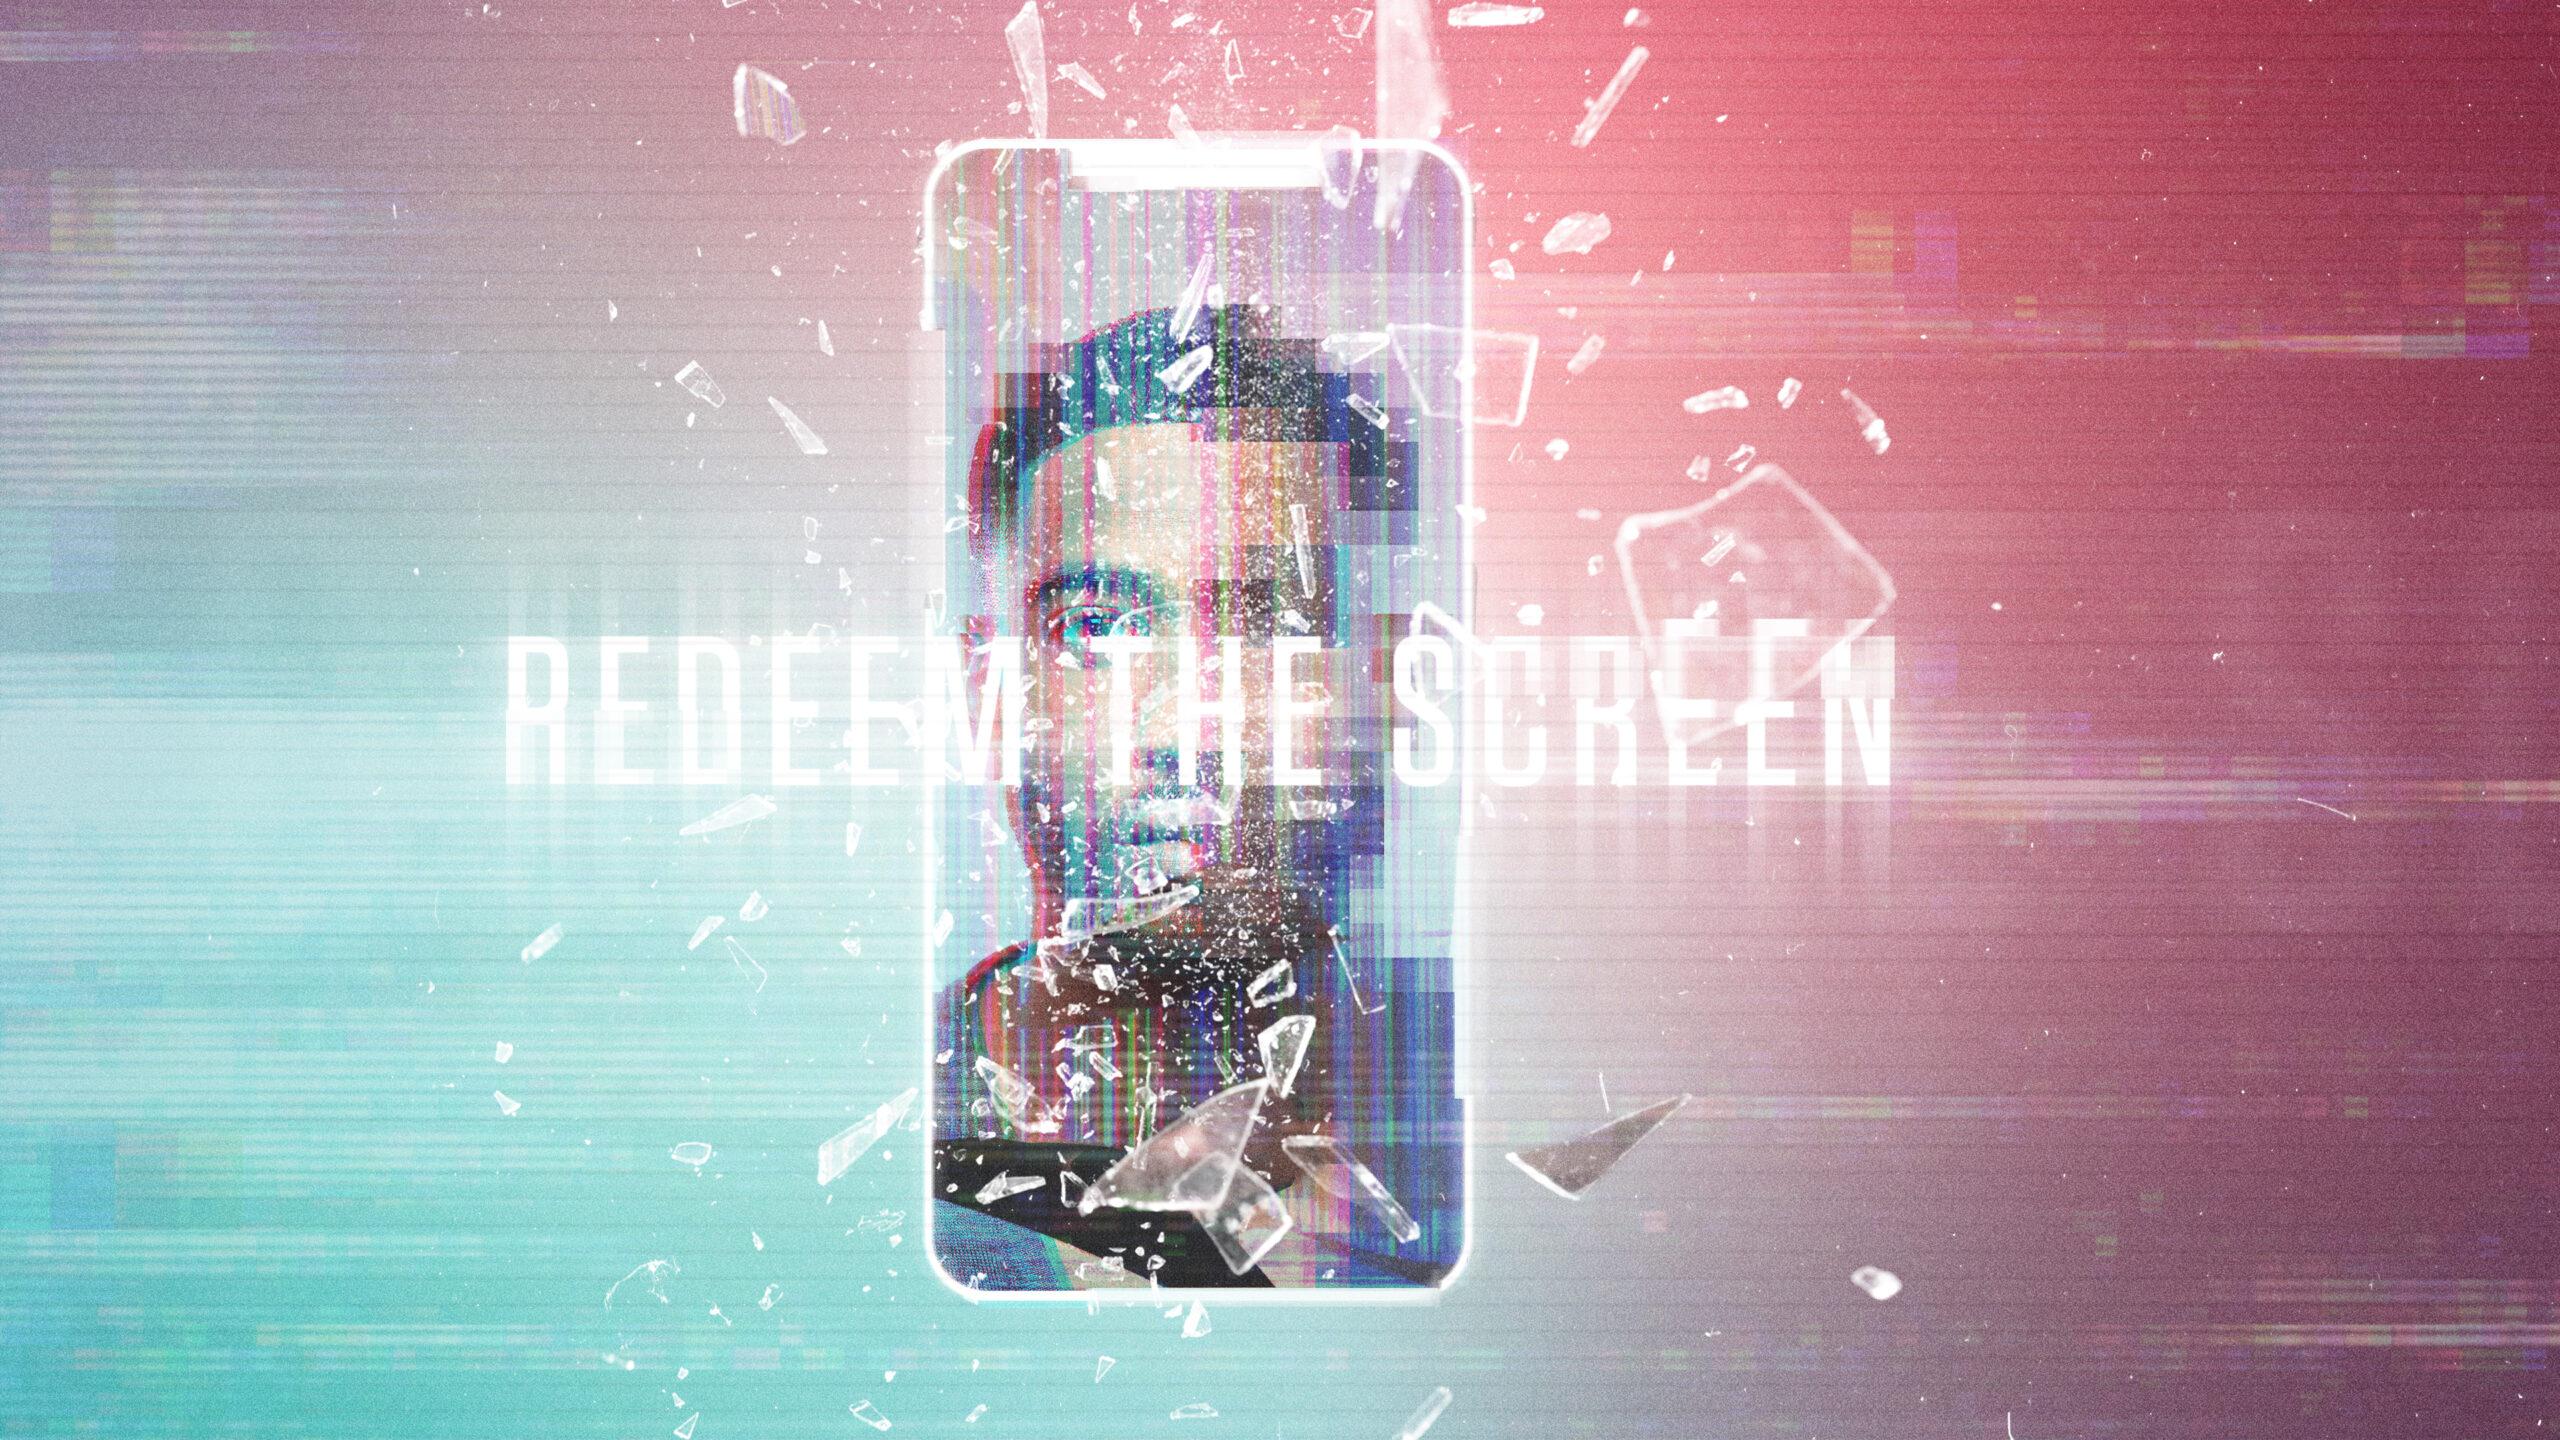 Redeem The Screen